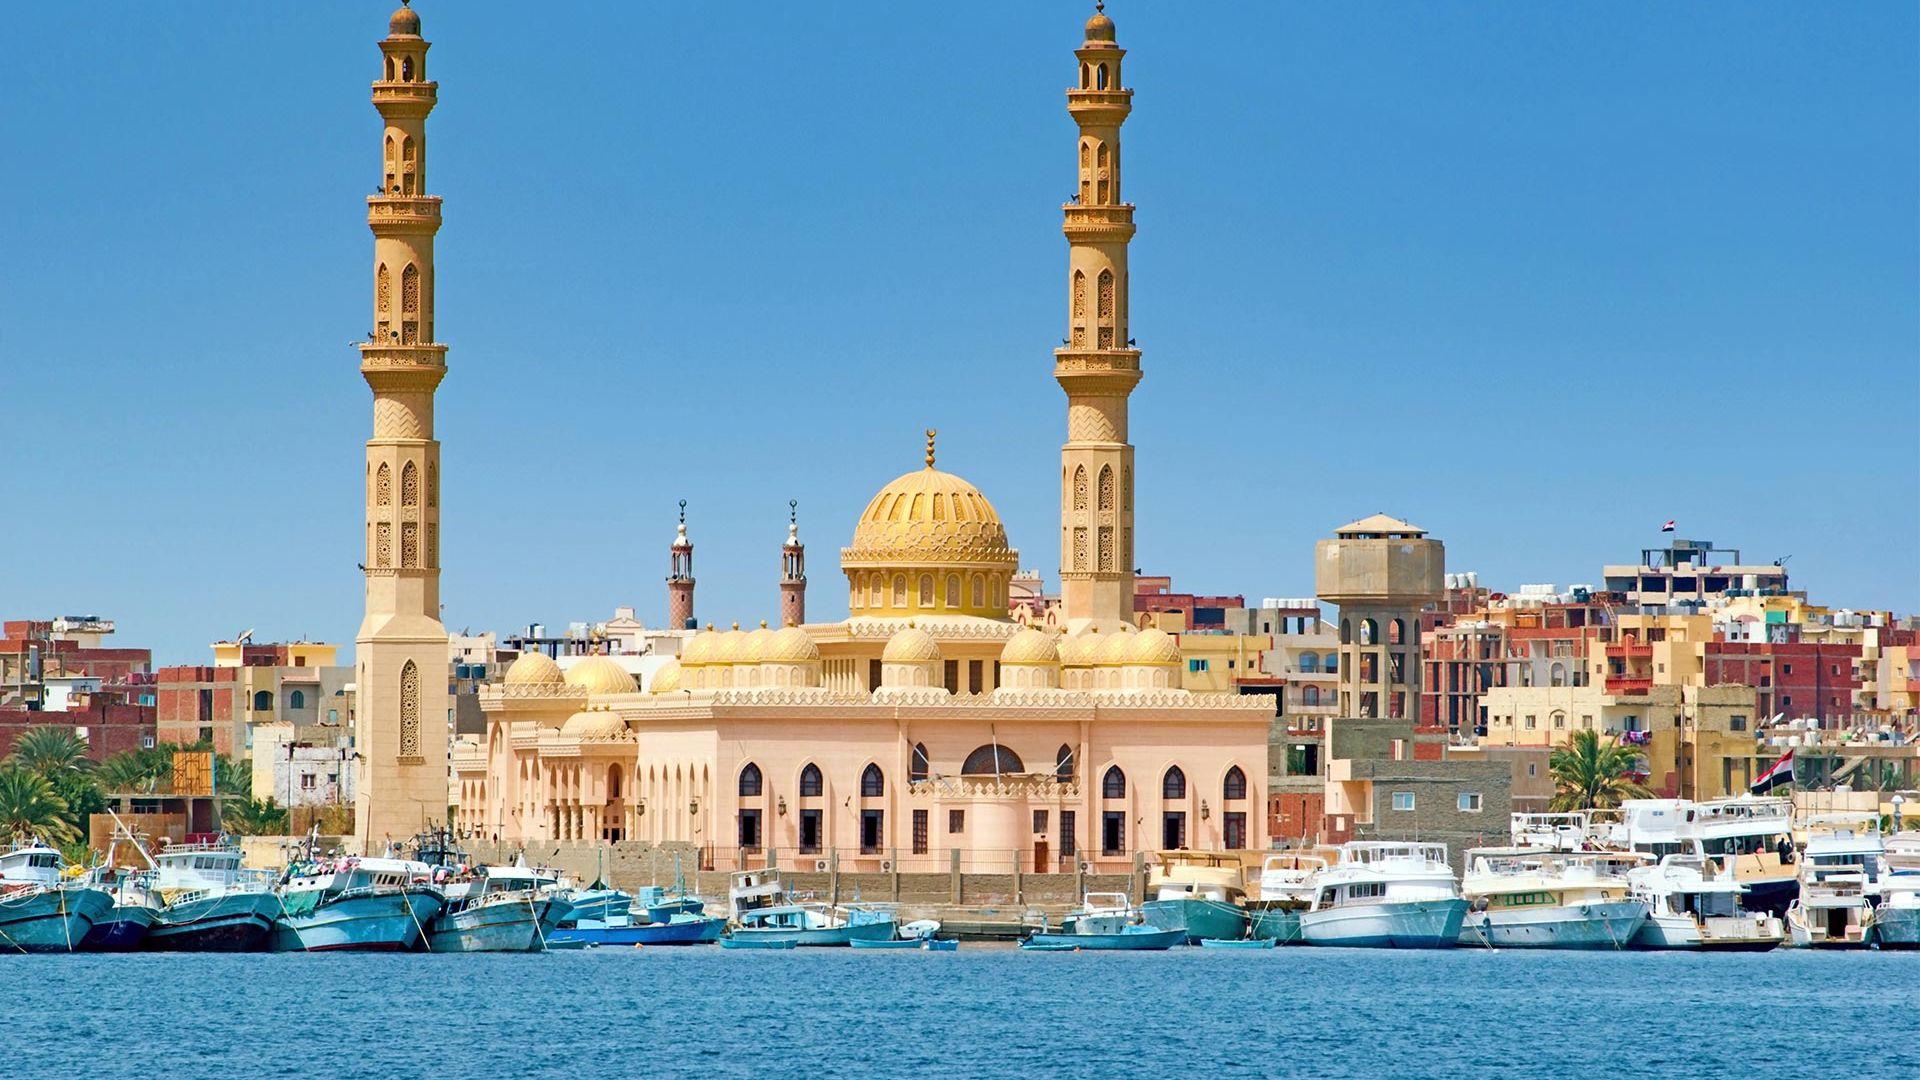 Share a trip - Hurghada & Luxor, Egipt, 8 zile